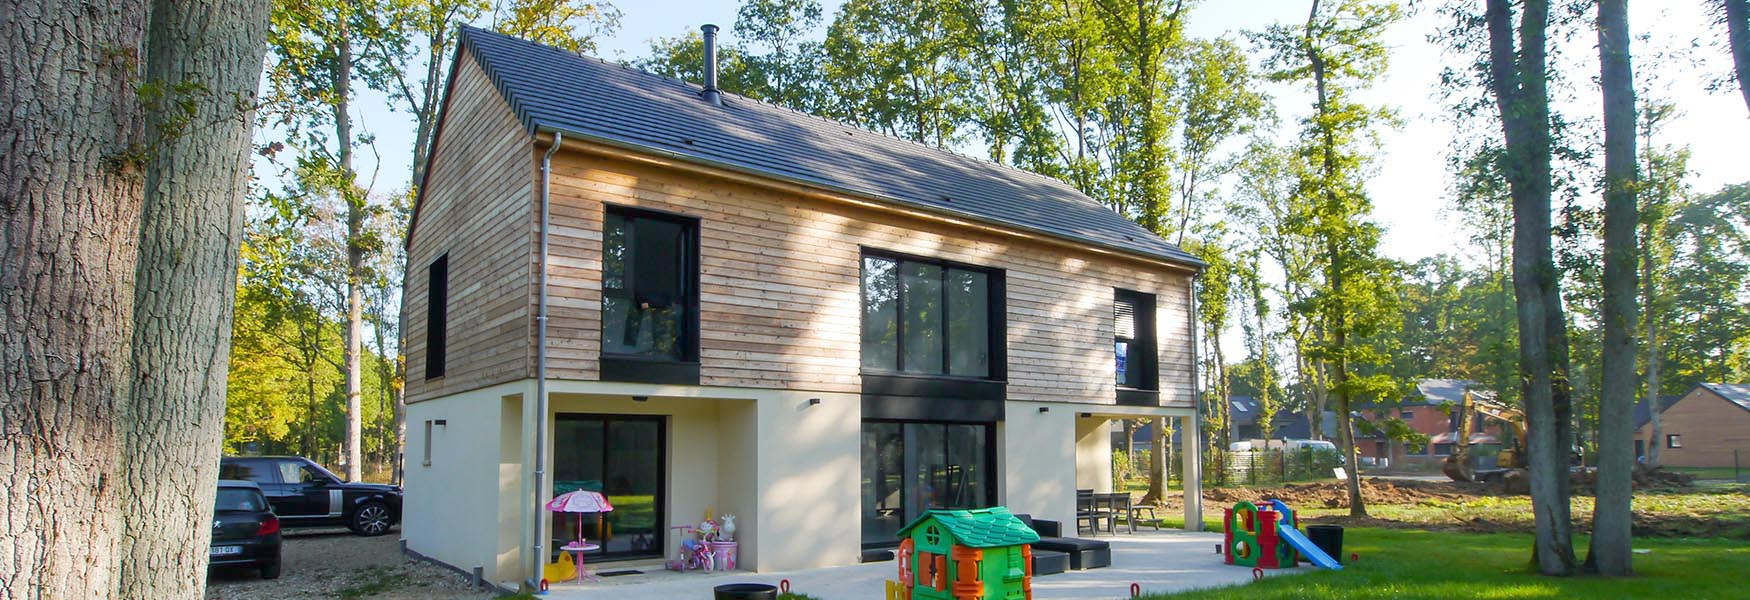 constructeur maison bois yvelines ventana blog. Black Bedroom Furniture Sets. Home Design Ideas